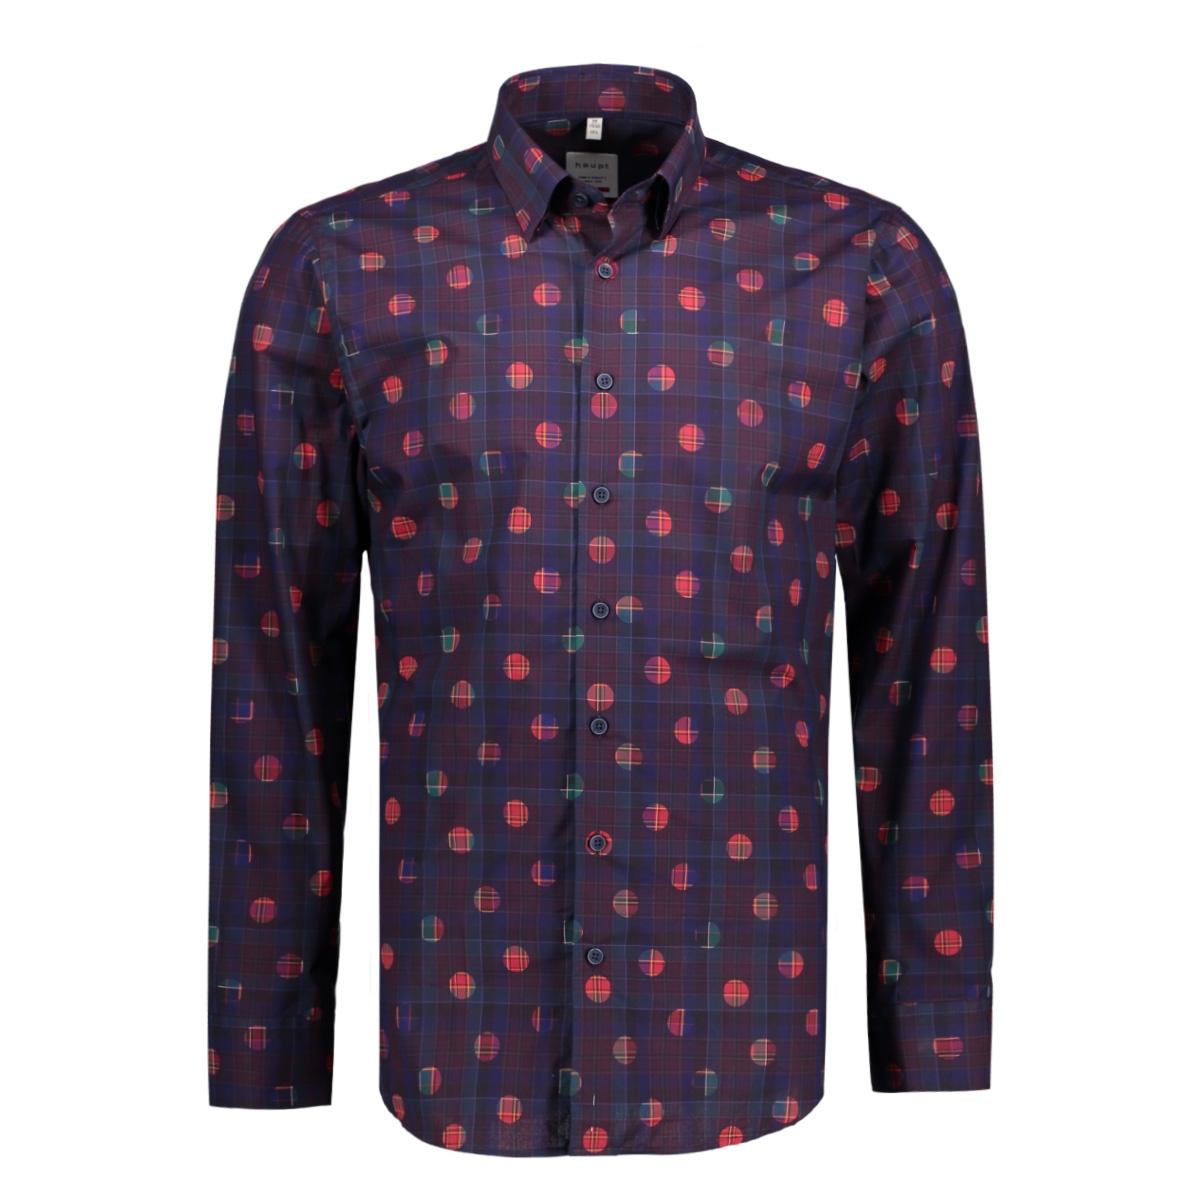 3371 7151 haupt overhemd 01